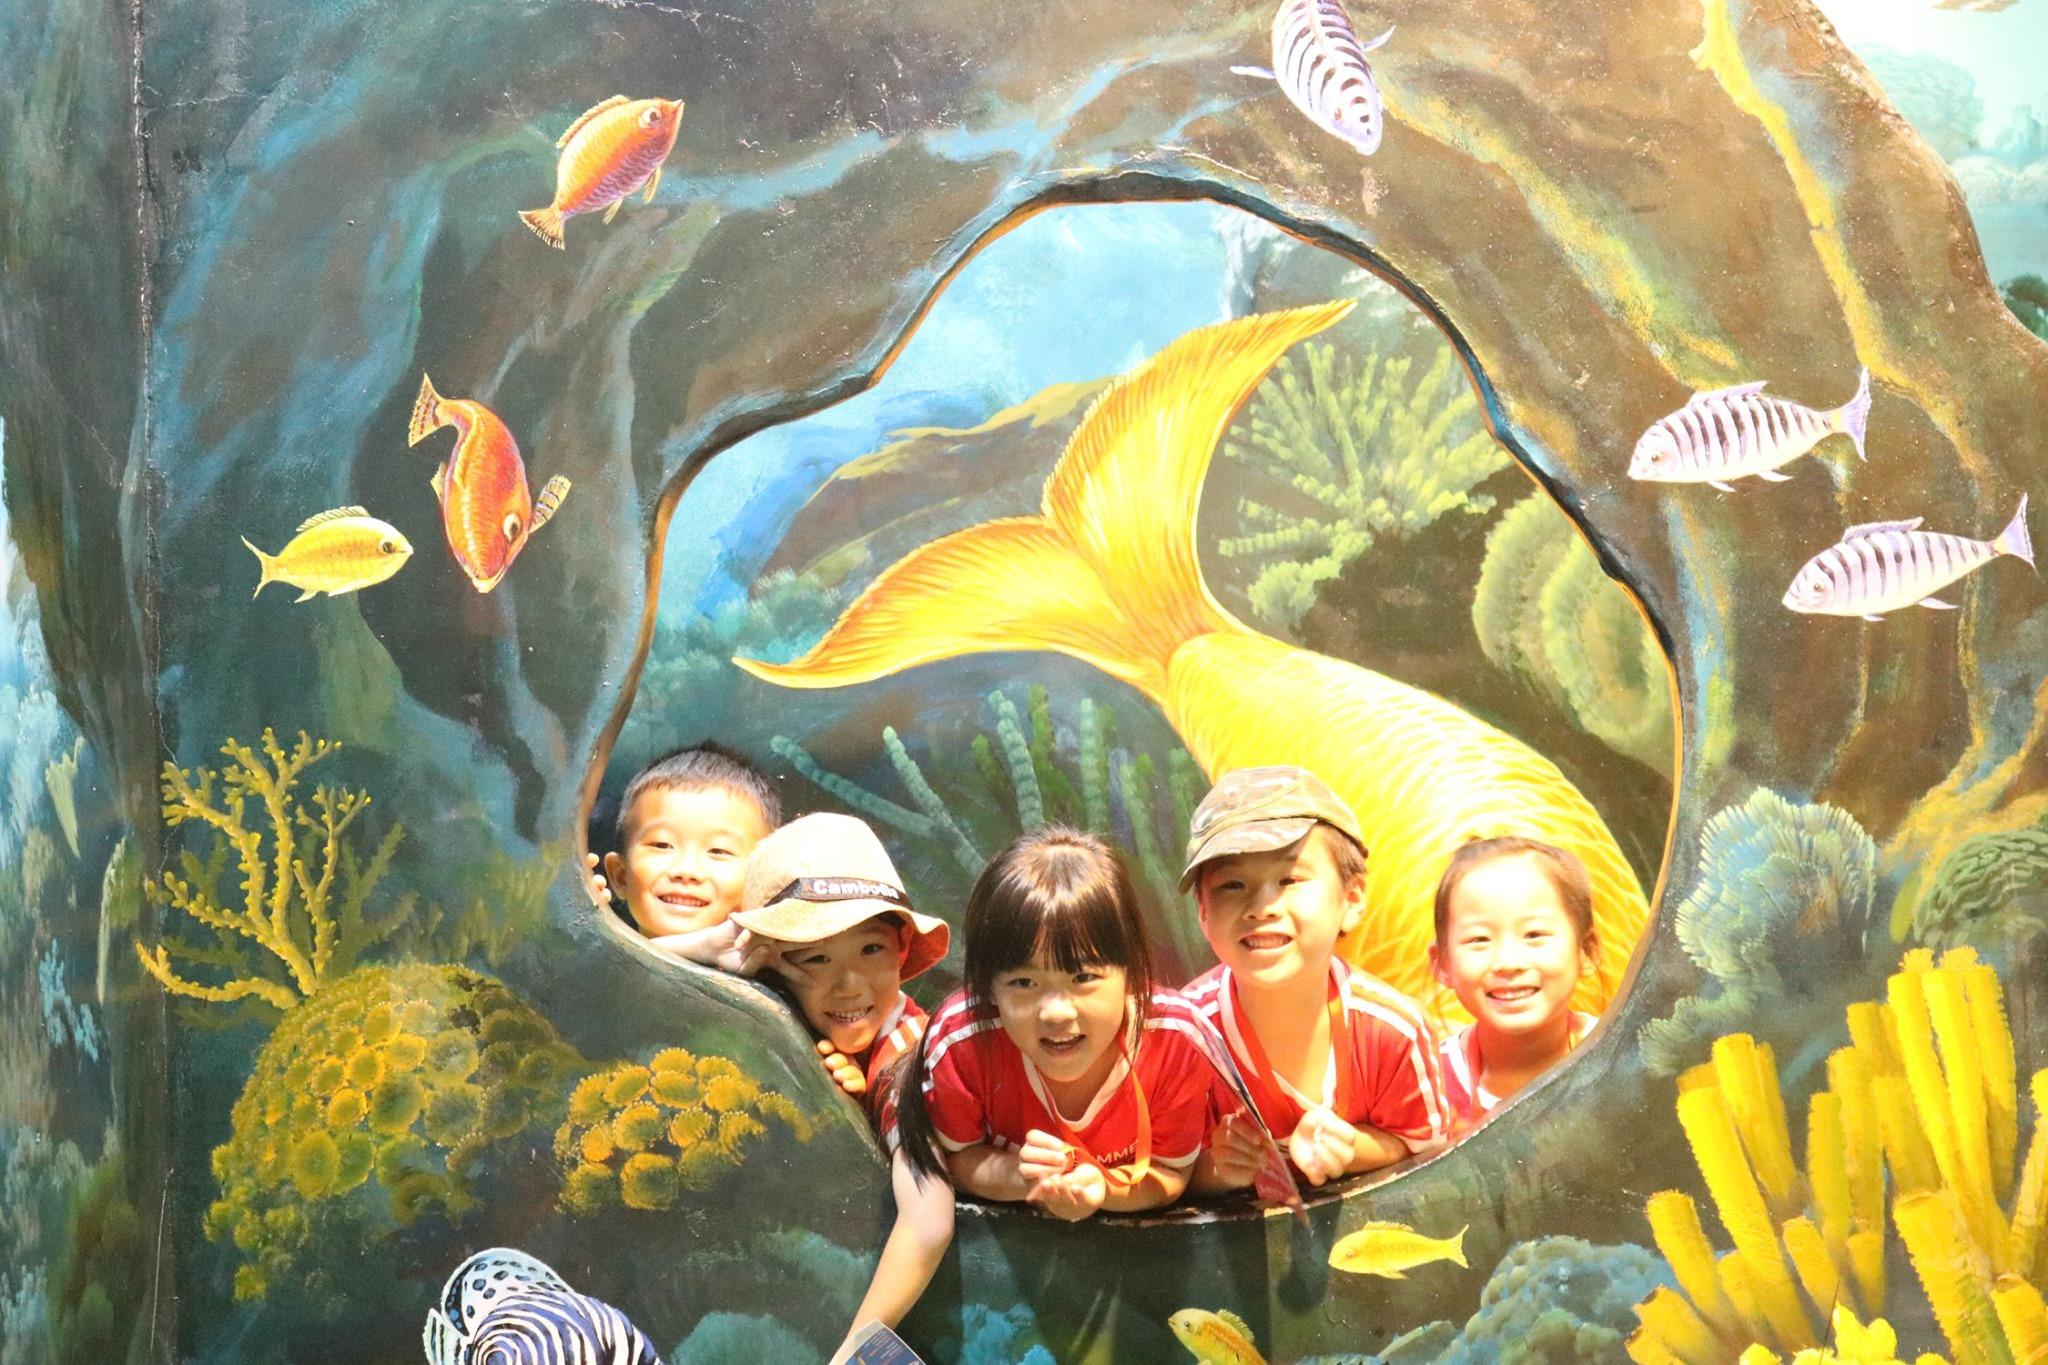 NIS-Summer-School-2019-Day-24-Kiddy-Land-85